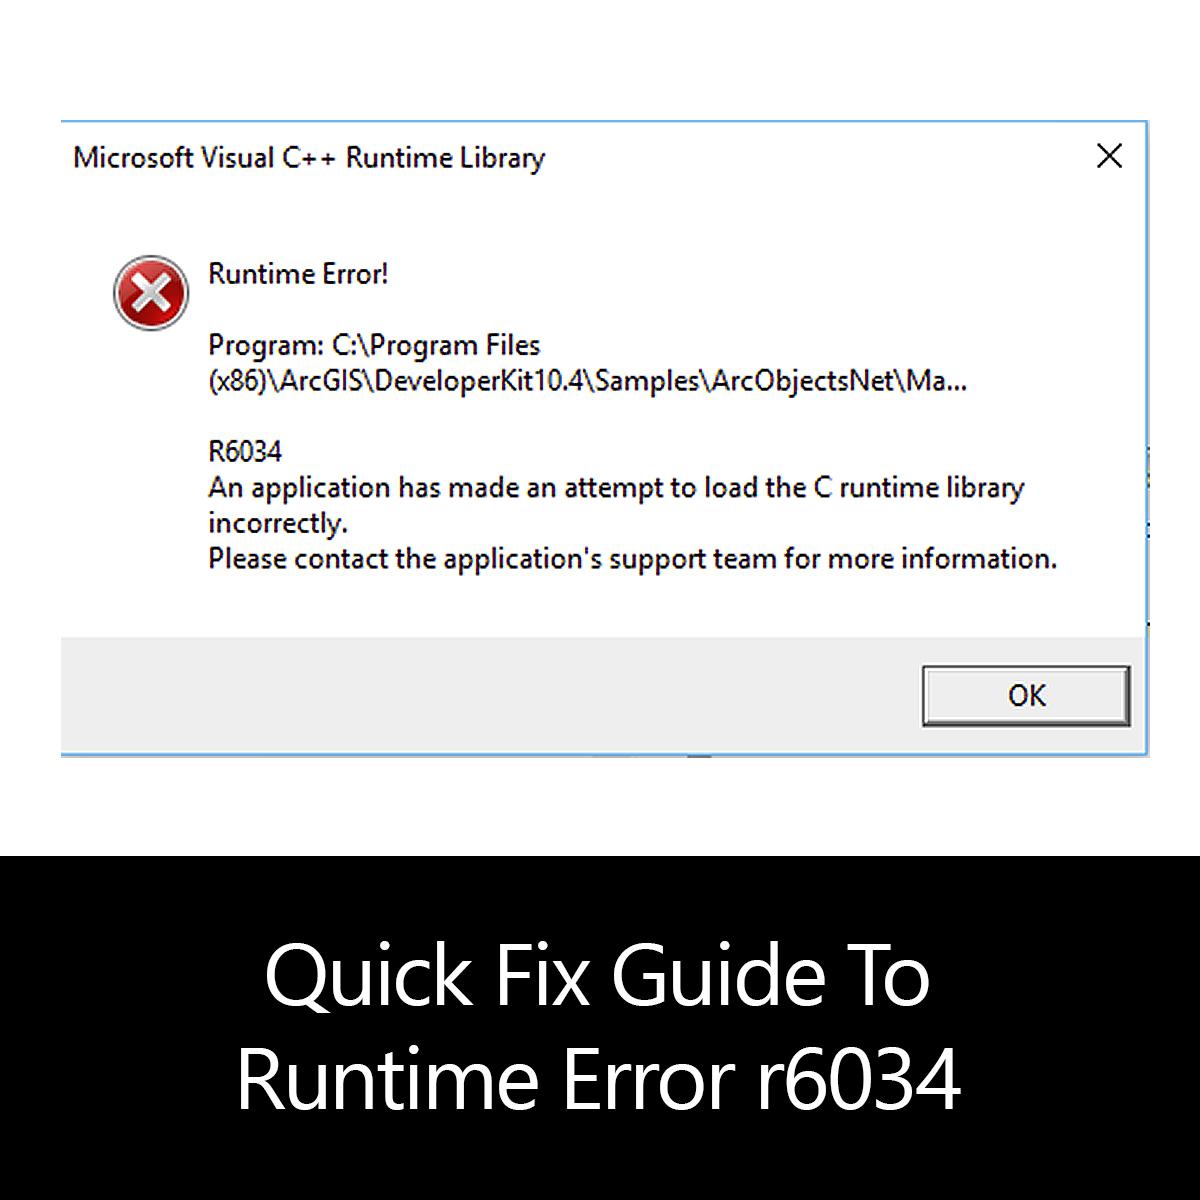 Quick Fix Guide To Runtime Error r6034